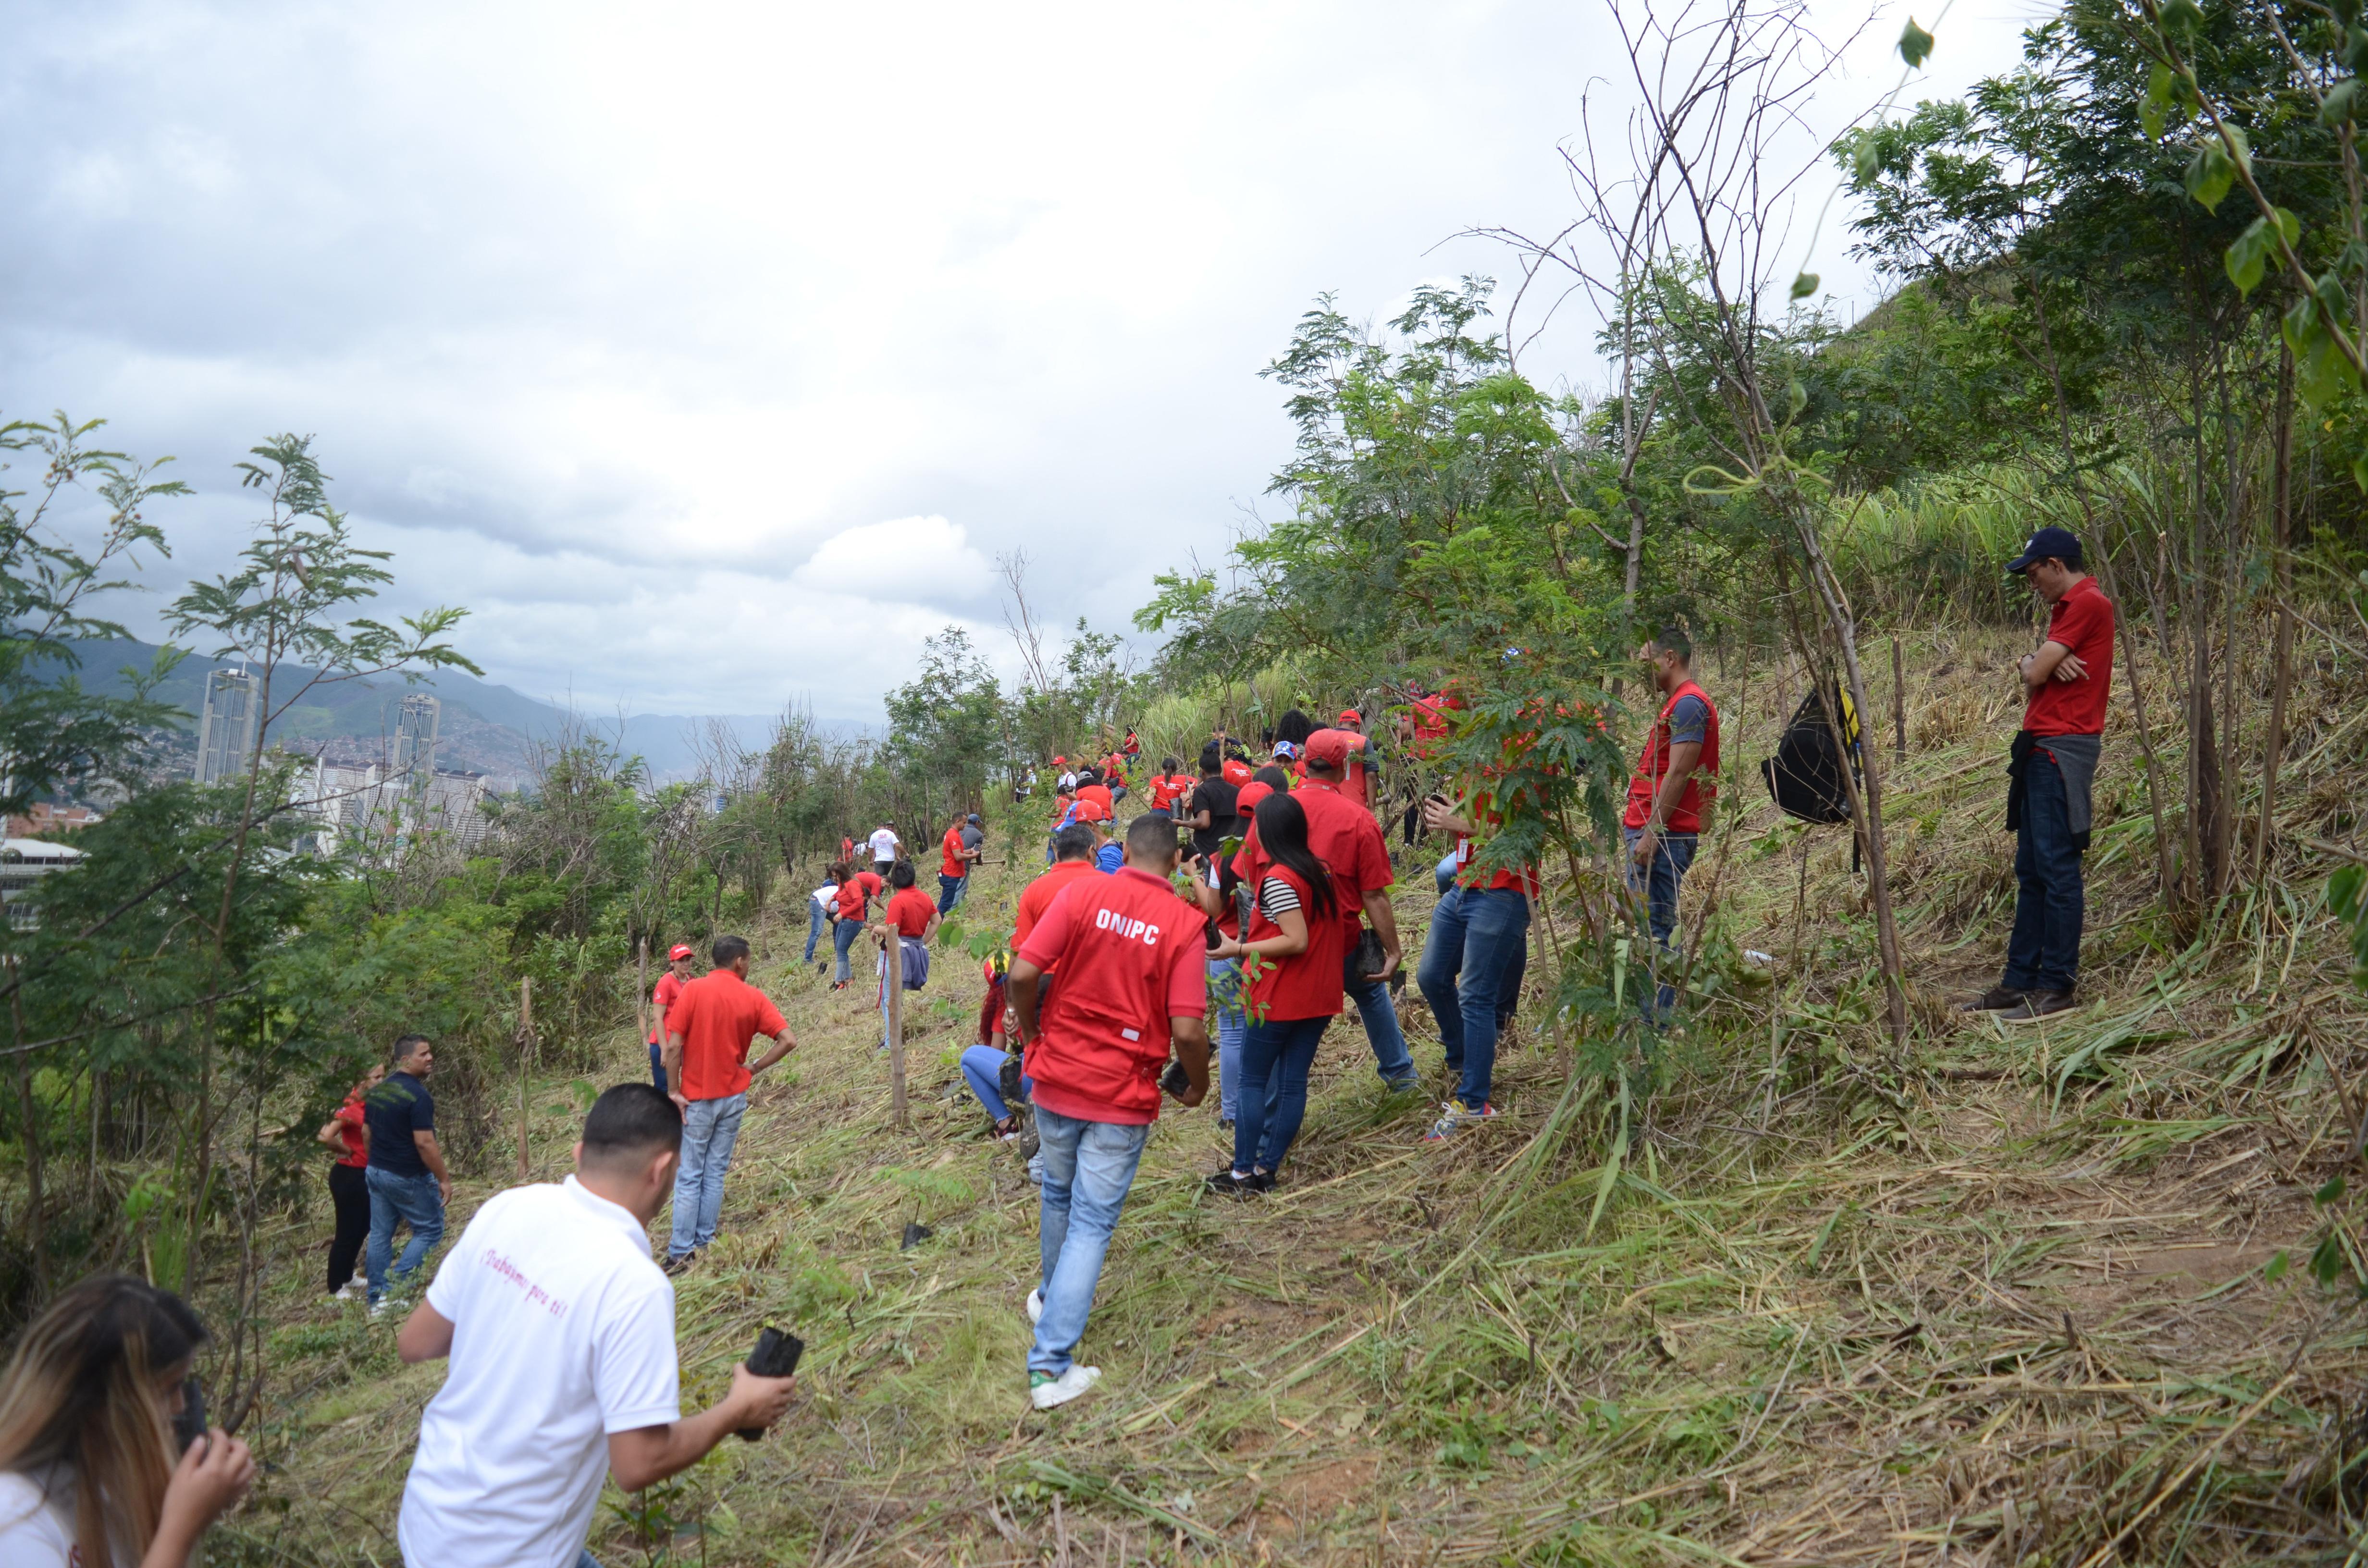 Seniat e Inparques plantaron 200 árboles en el Waraira Repano